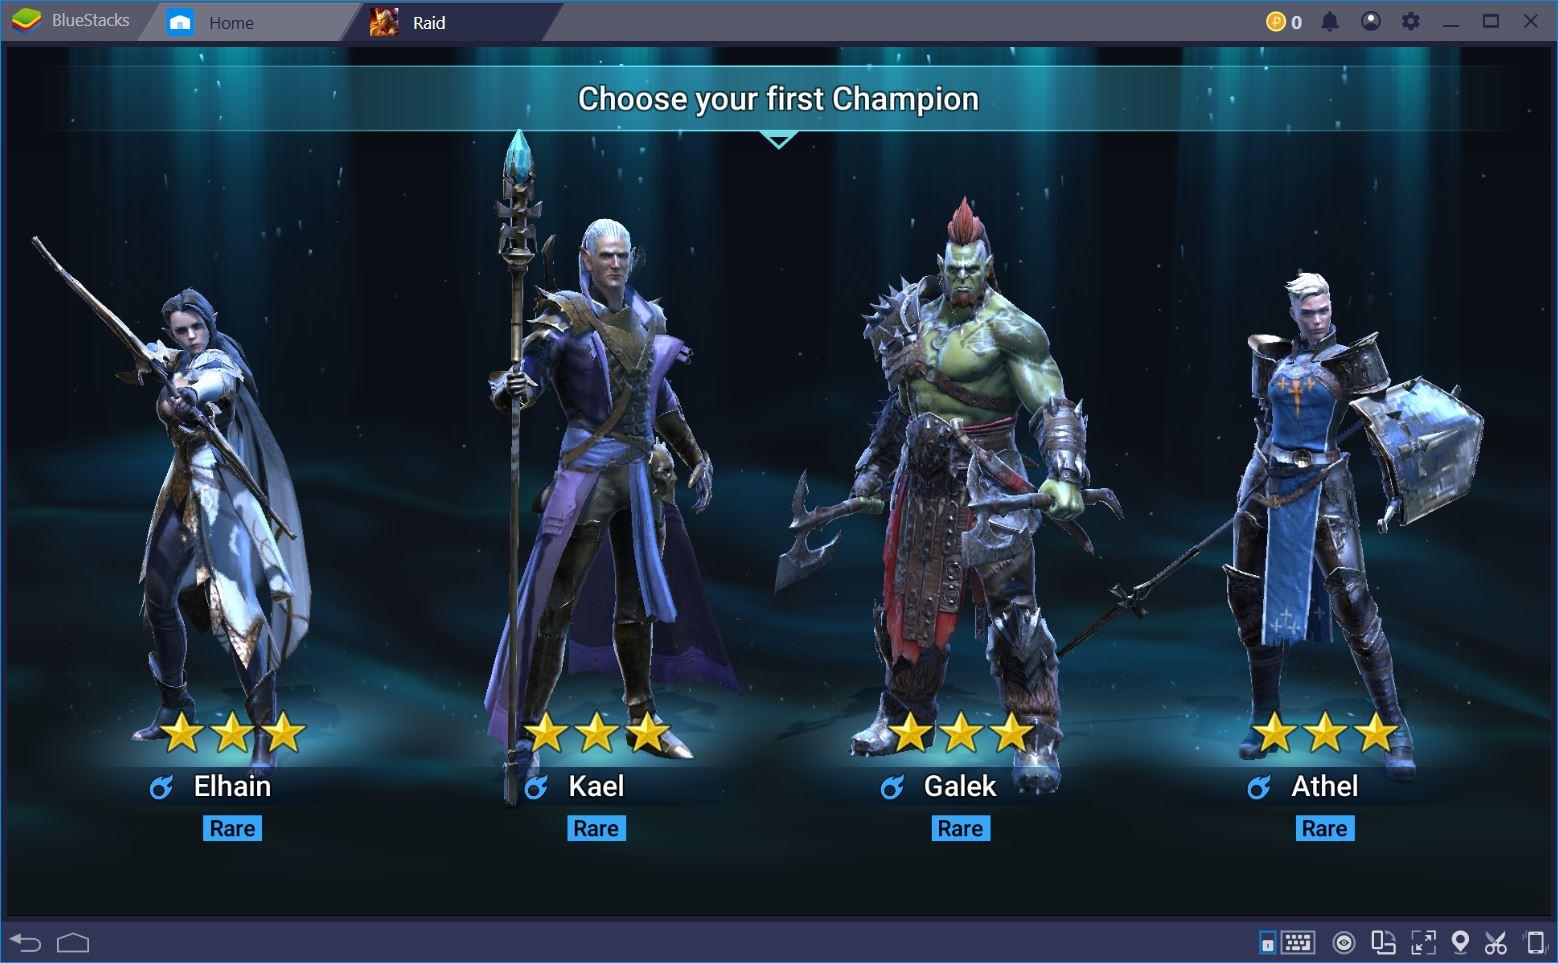 RAID: Shadow Legends على جهاز الكمبيوتر – أفضل بطل وإعداد مبكر للعبة